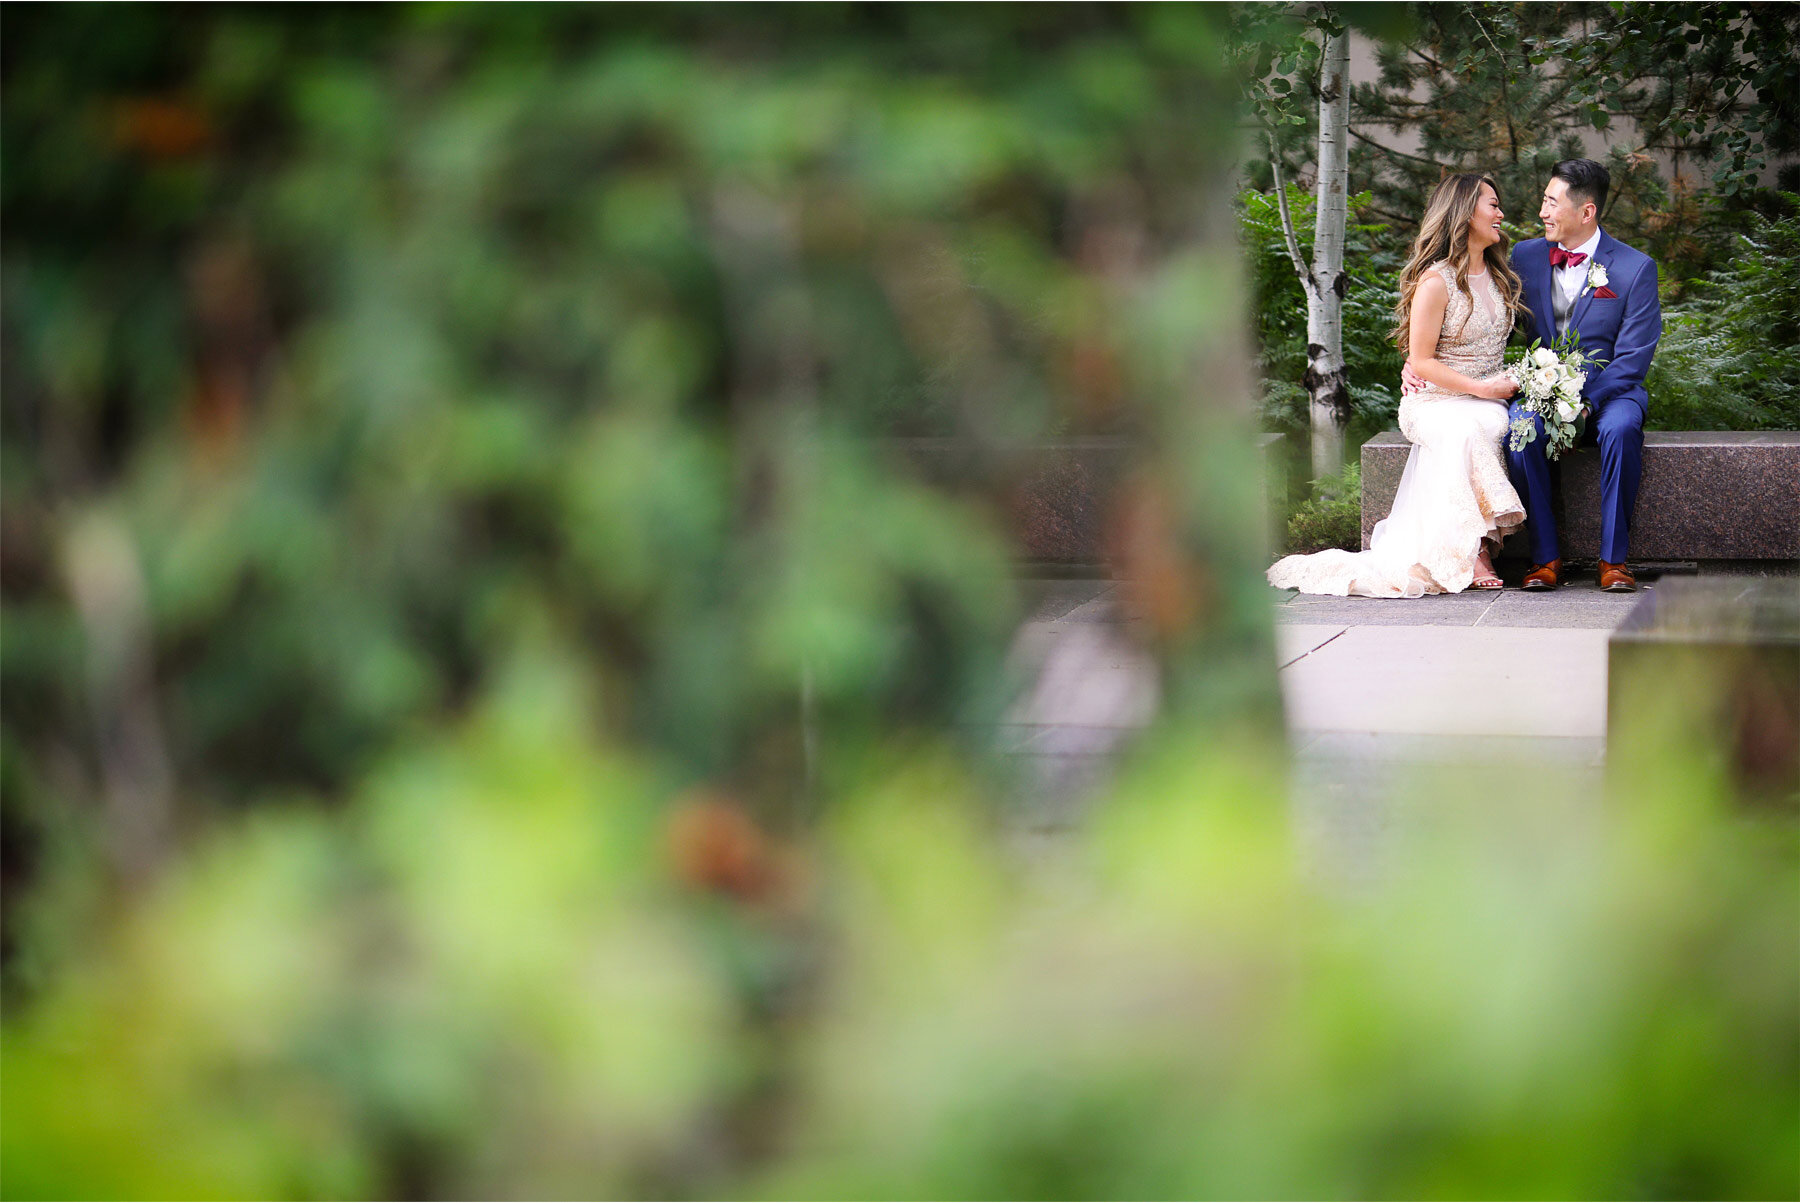 11-Vick-Photography-Minneapolis-Minnesota-Park-Garden-Bride-Groom-Mai-&-Ross.jpg